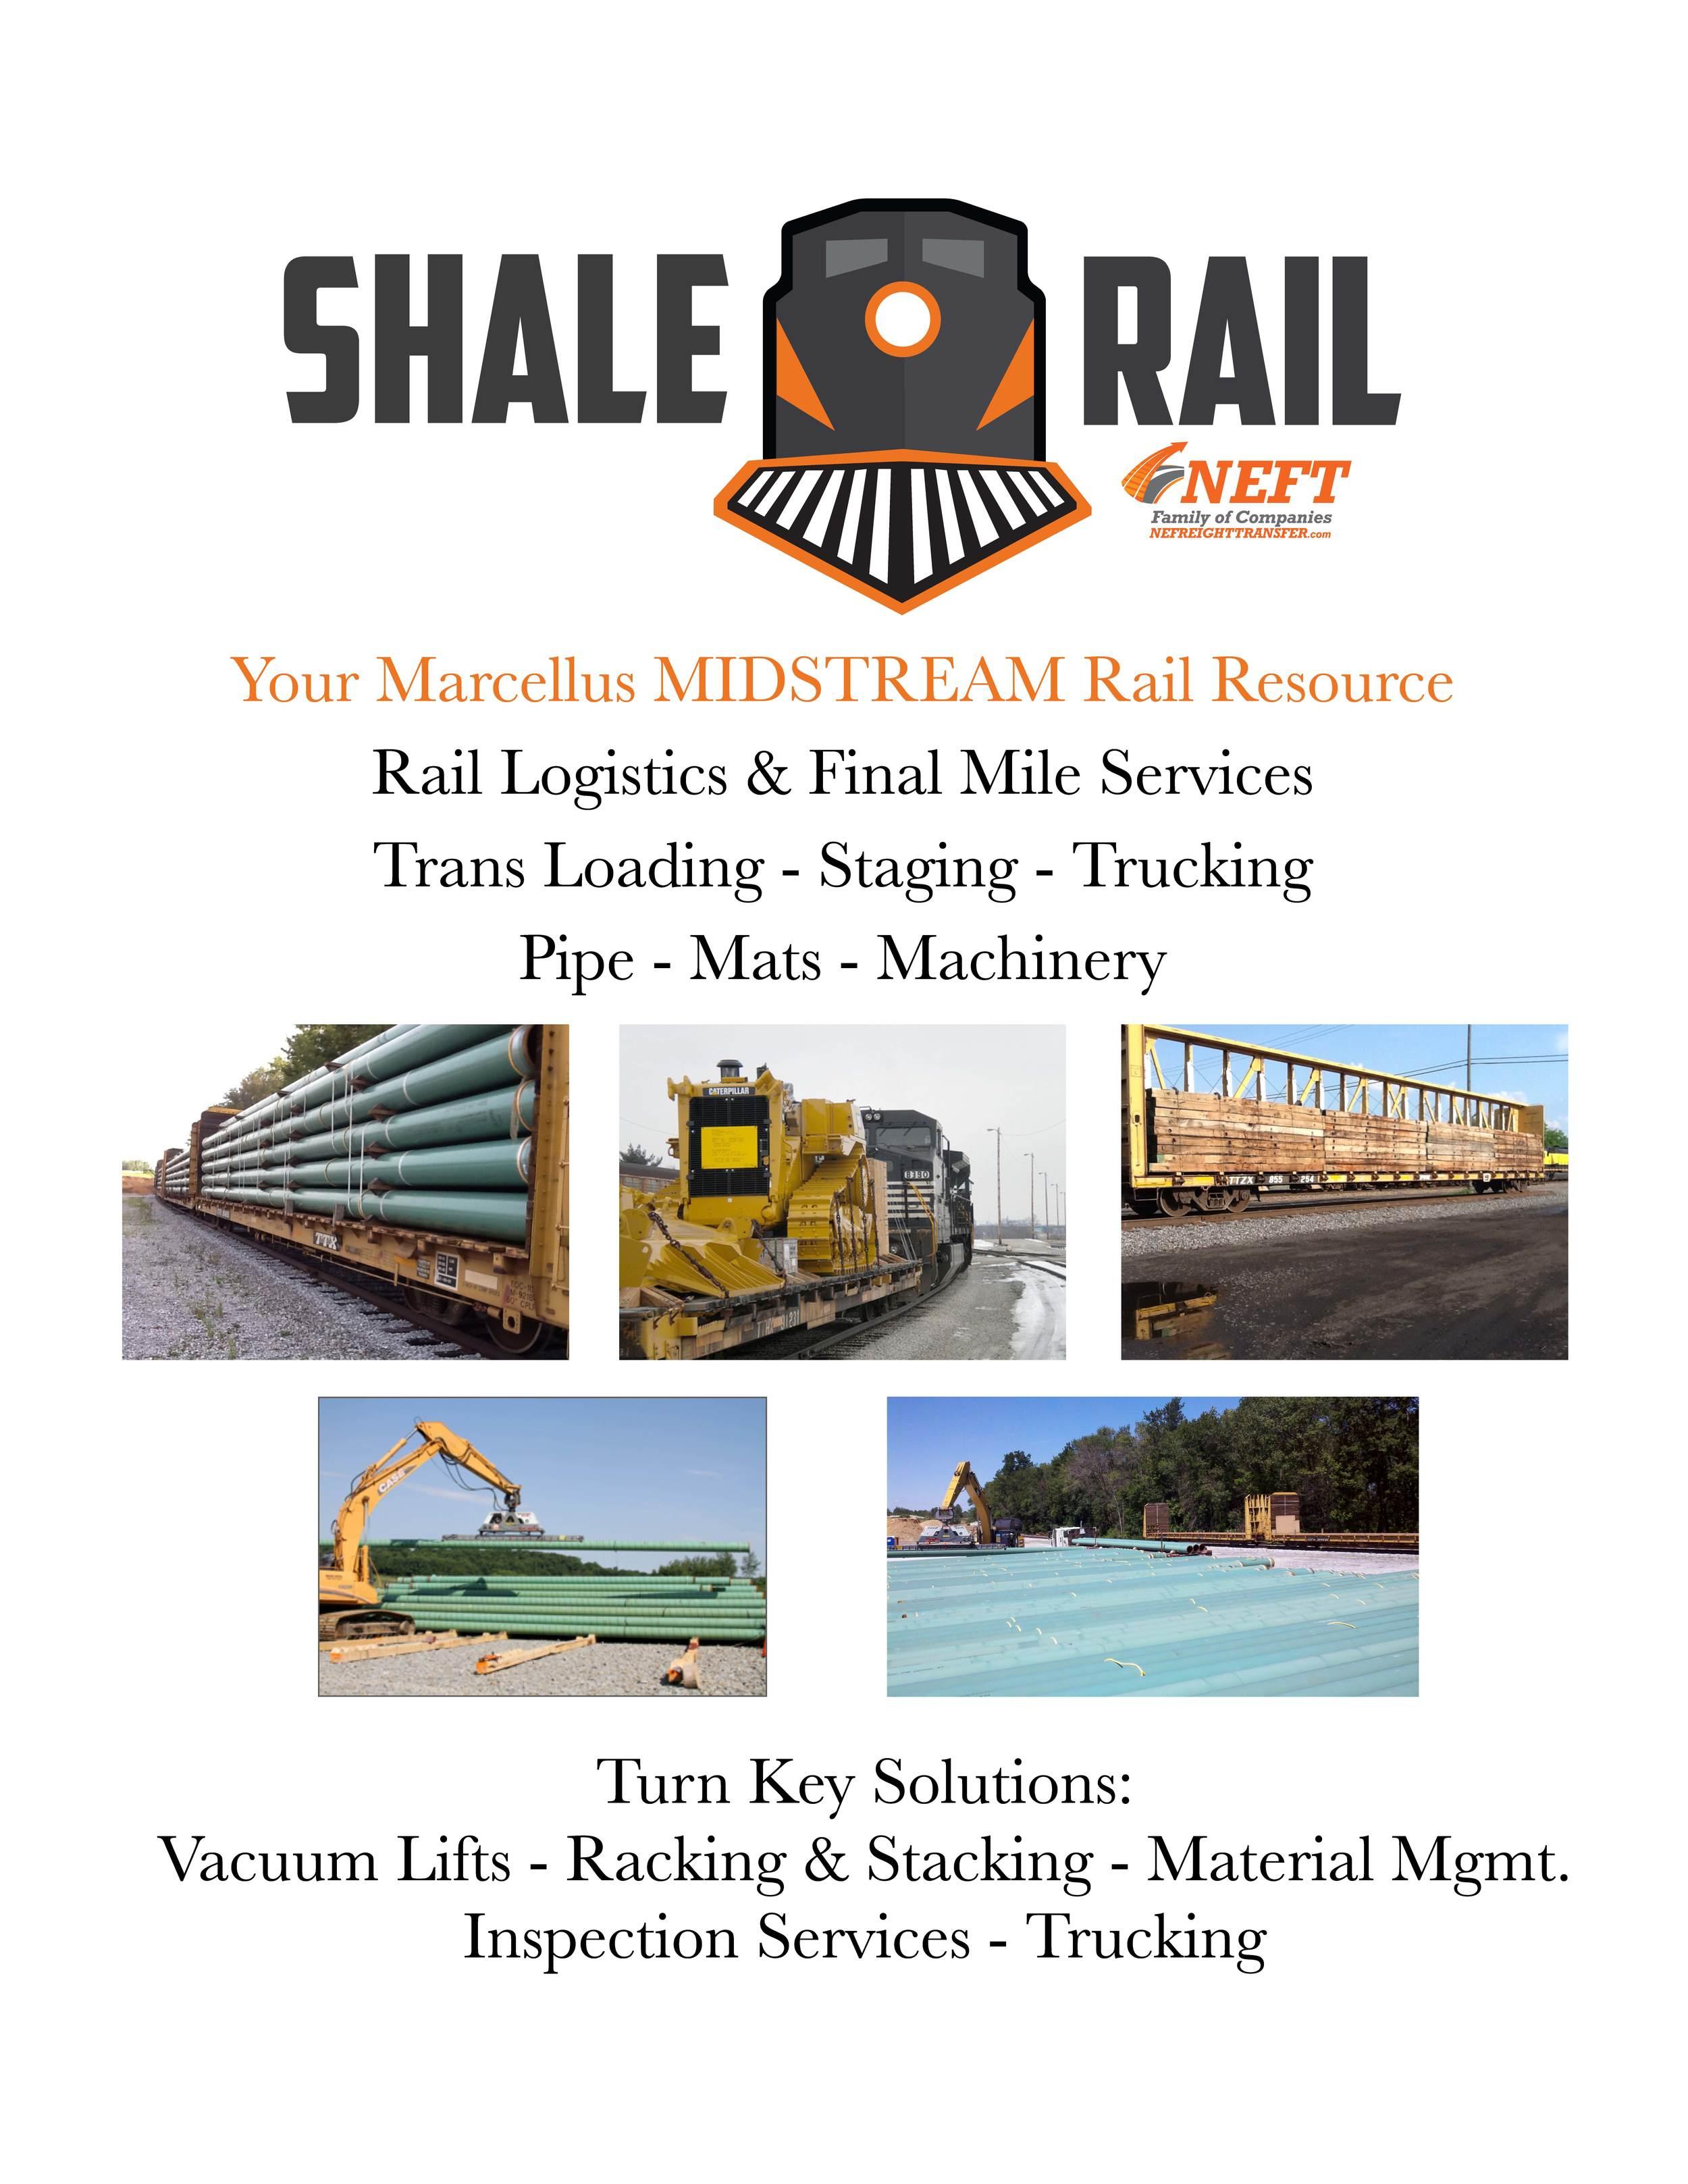 Pages1ShaleRail Midstream 2015.jpg